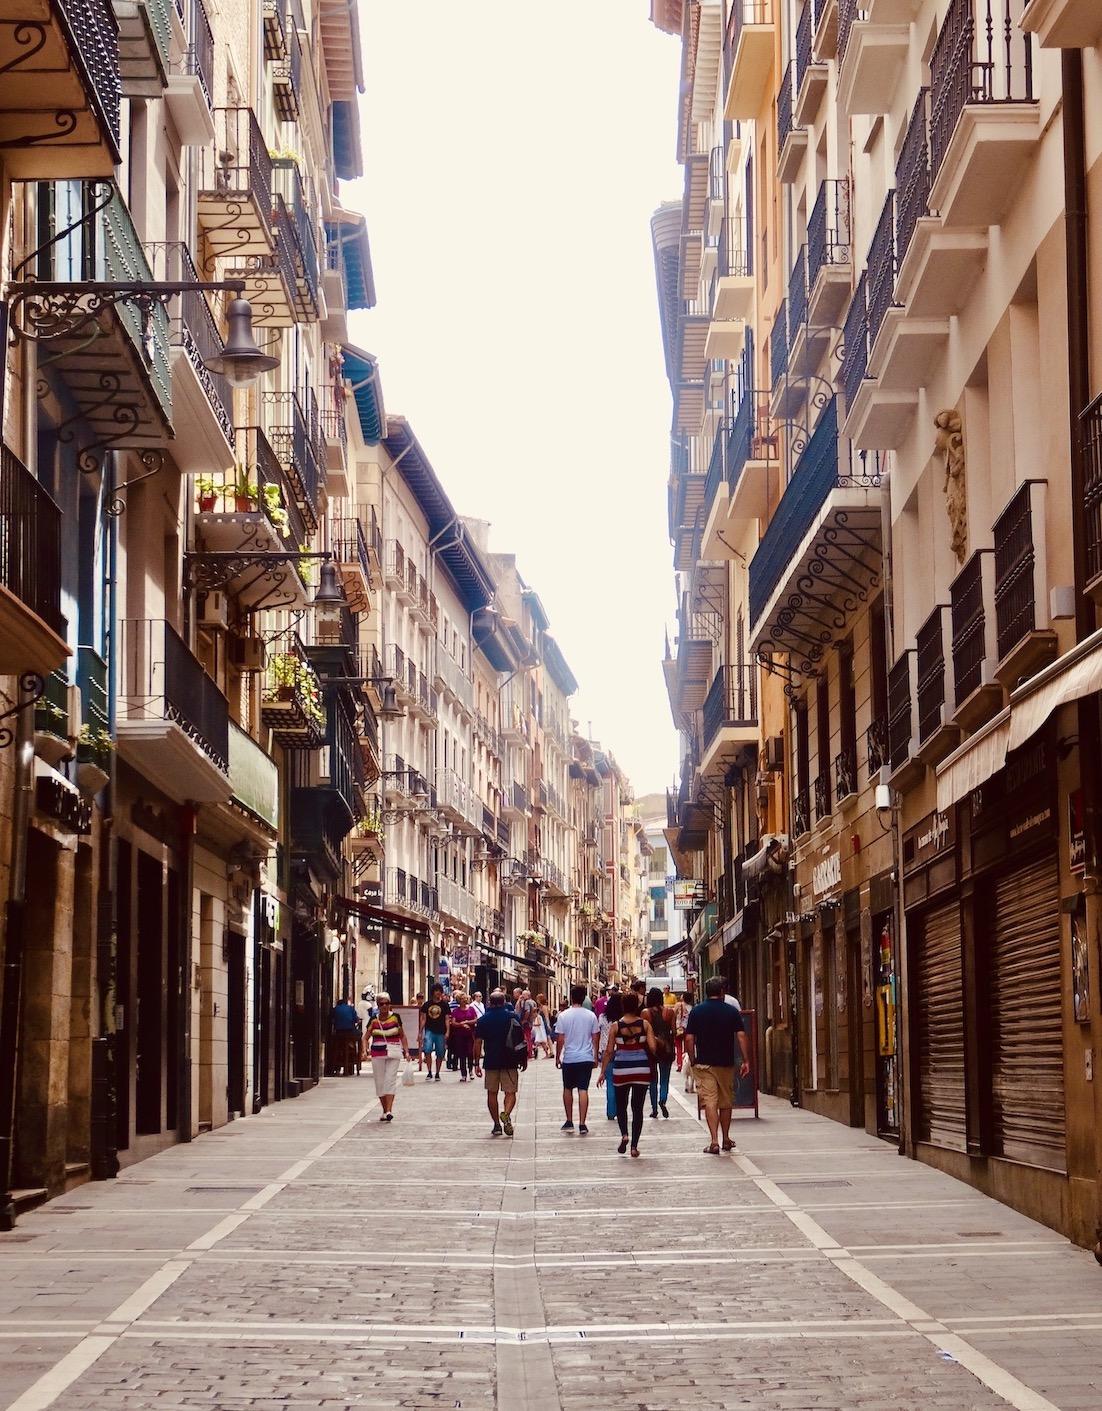 Calle de la Estafeta Pamplona.